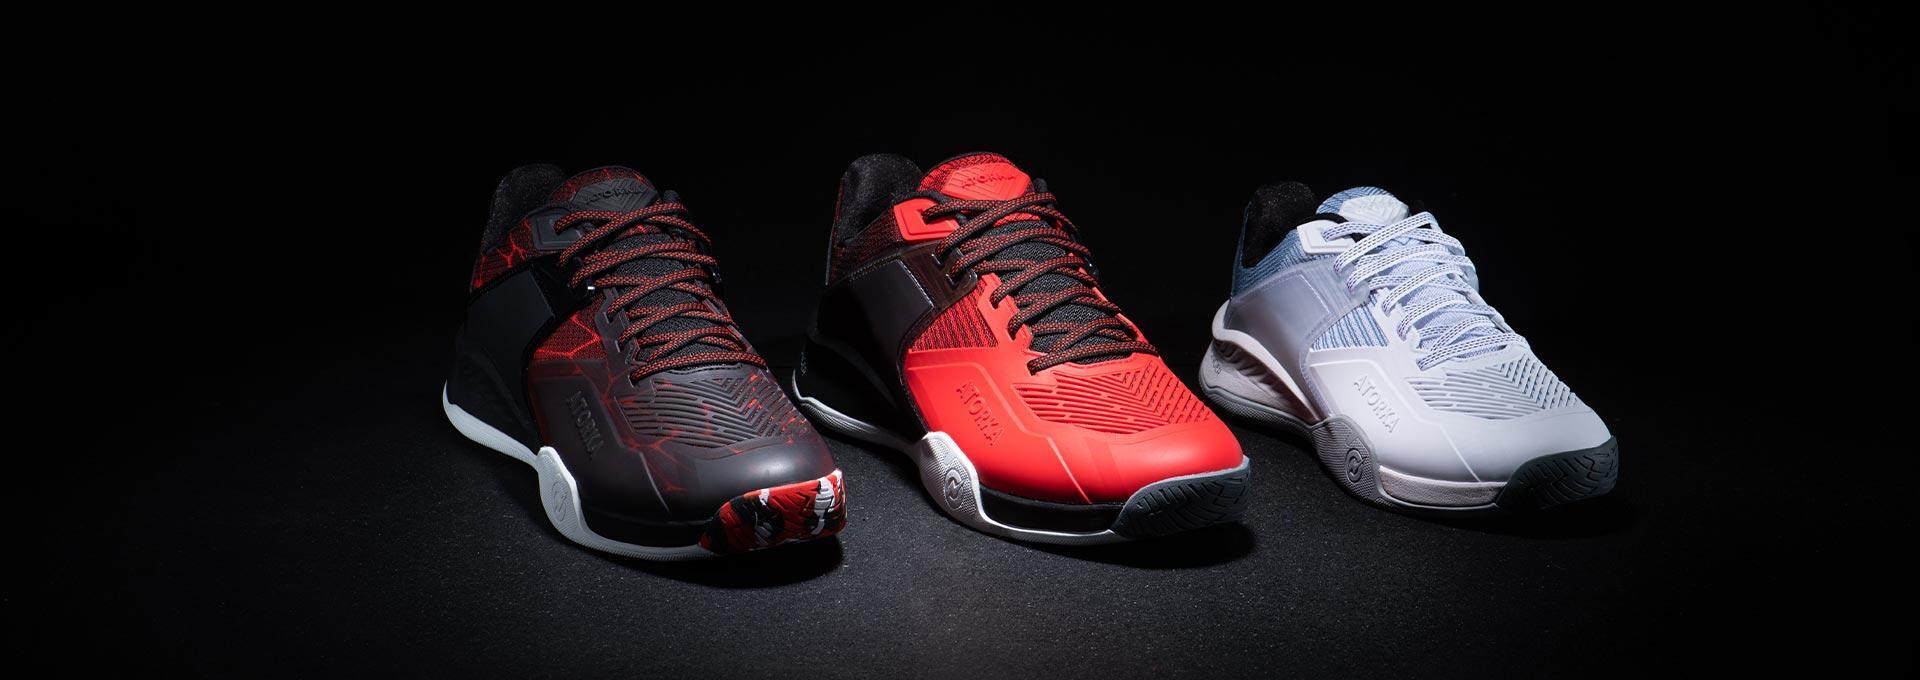 chaussures H900 handball